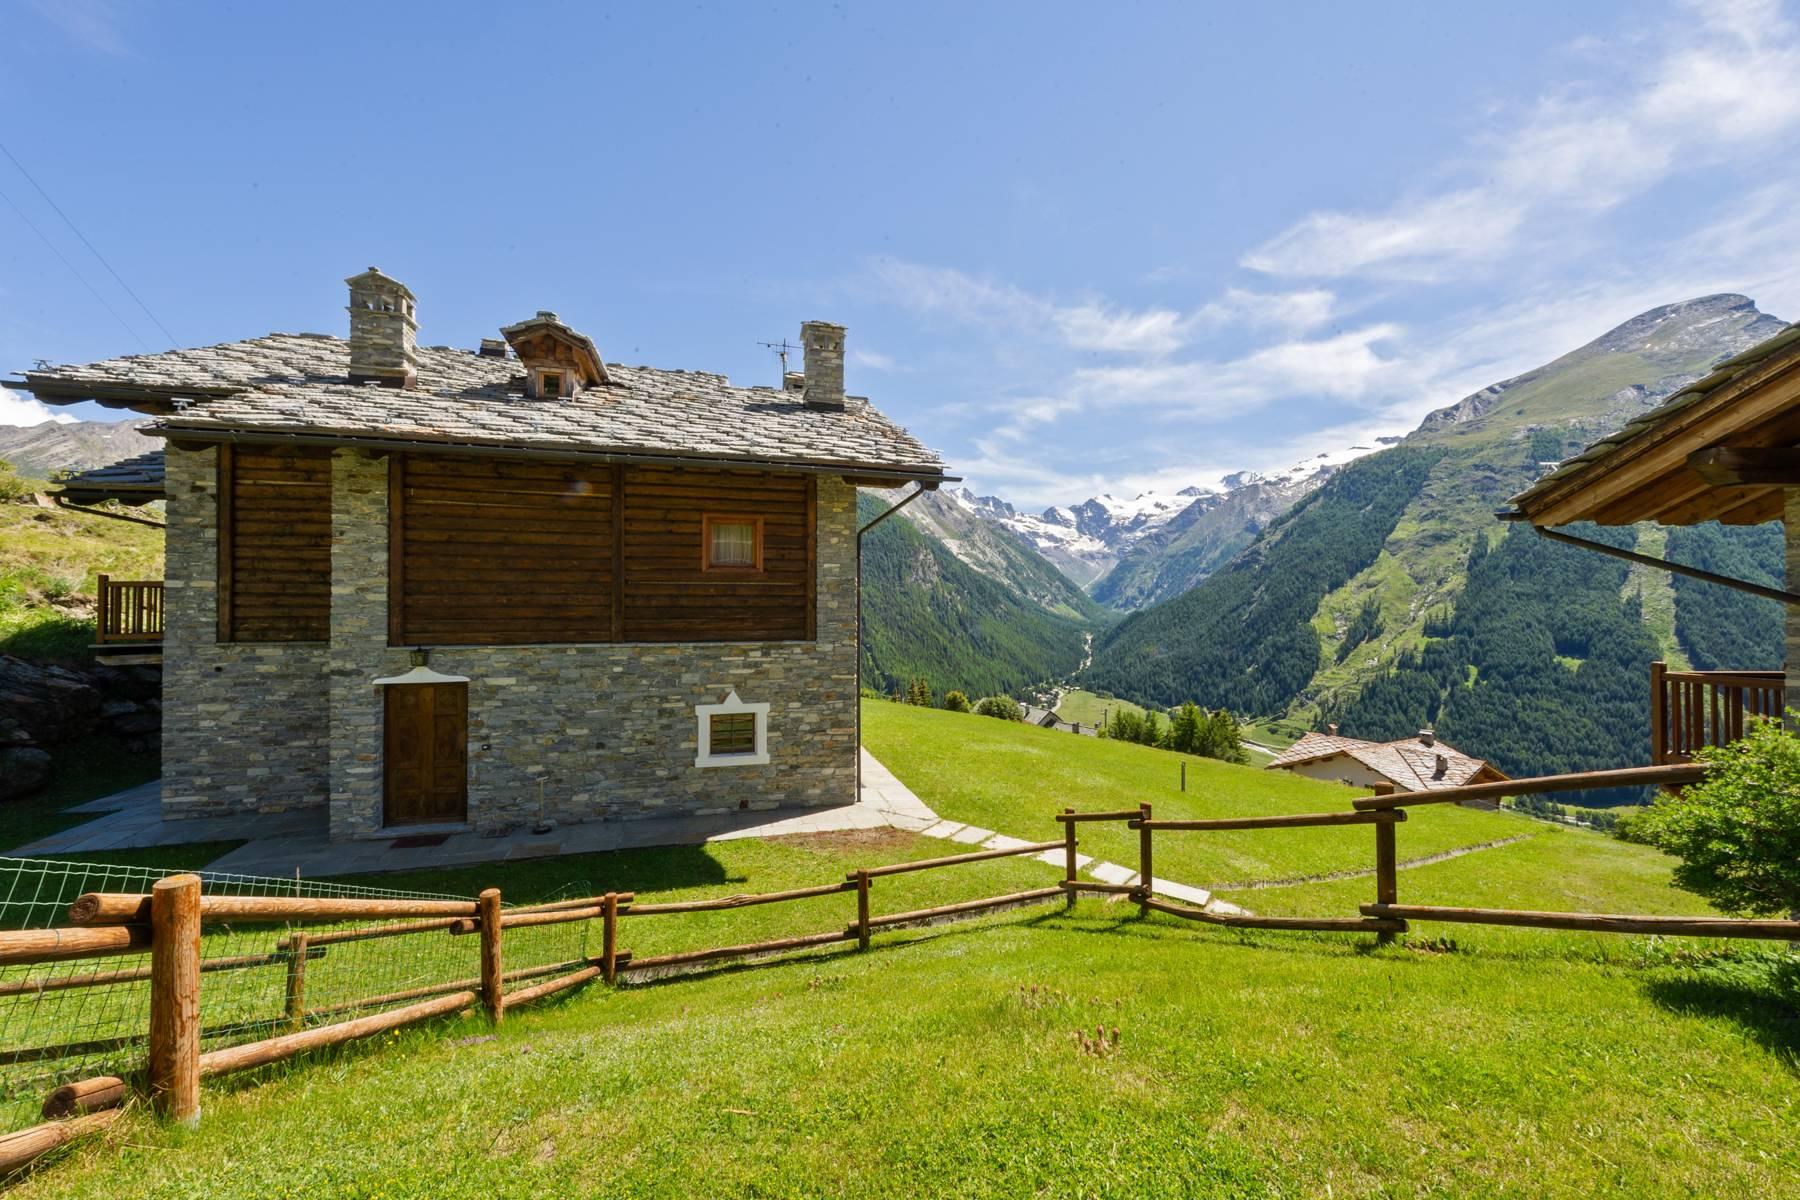 Villa in Vendita a Cogne: 5 locali, 377 mq - Foto 19